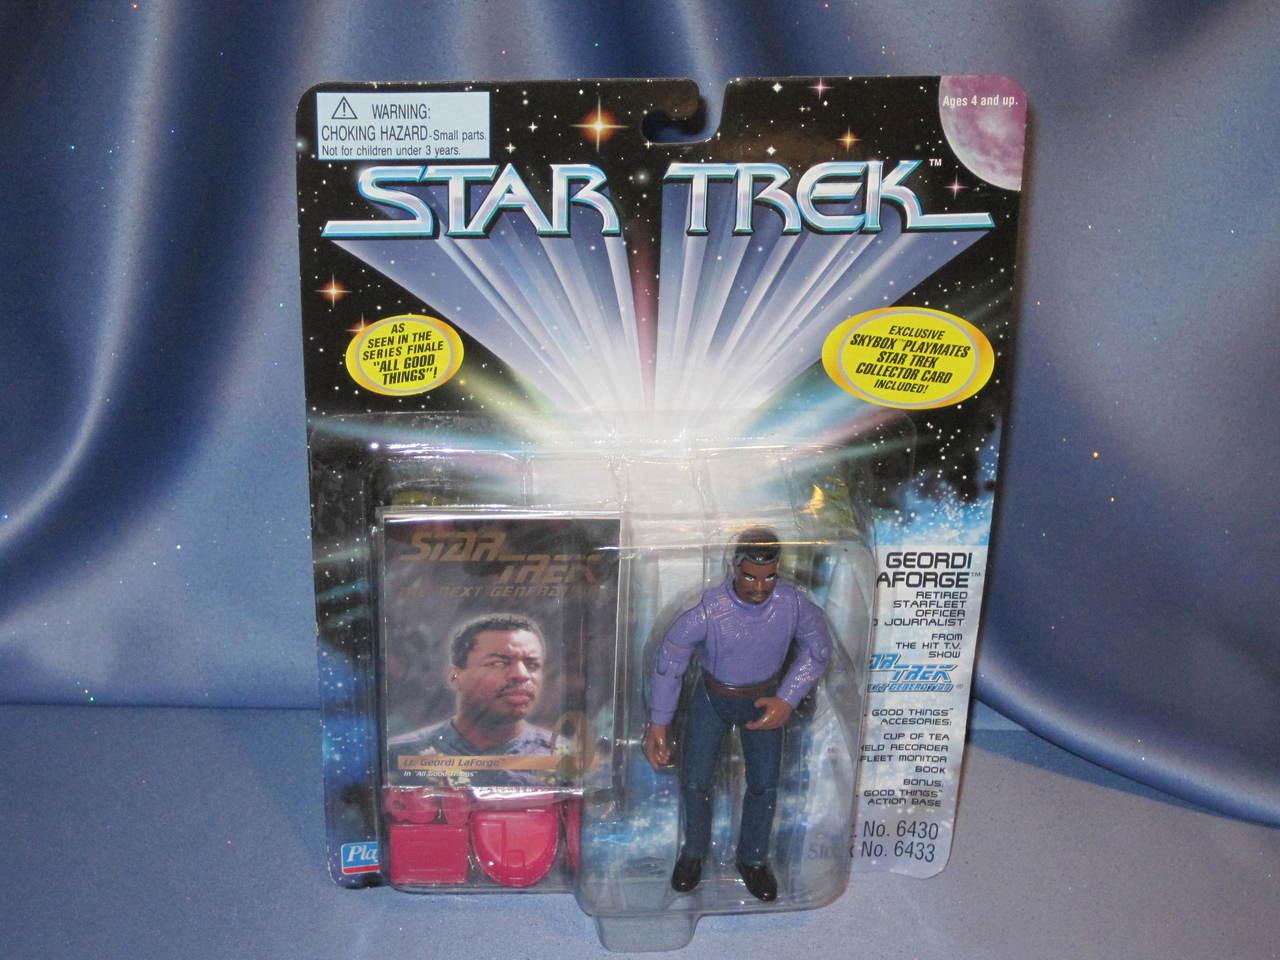 Star Trek - Geordi LaForge - Action Figure.